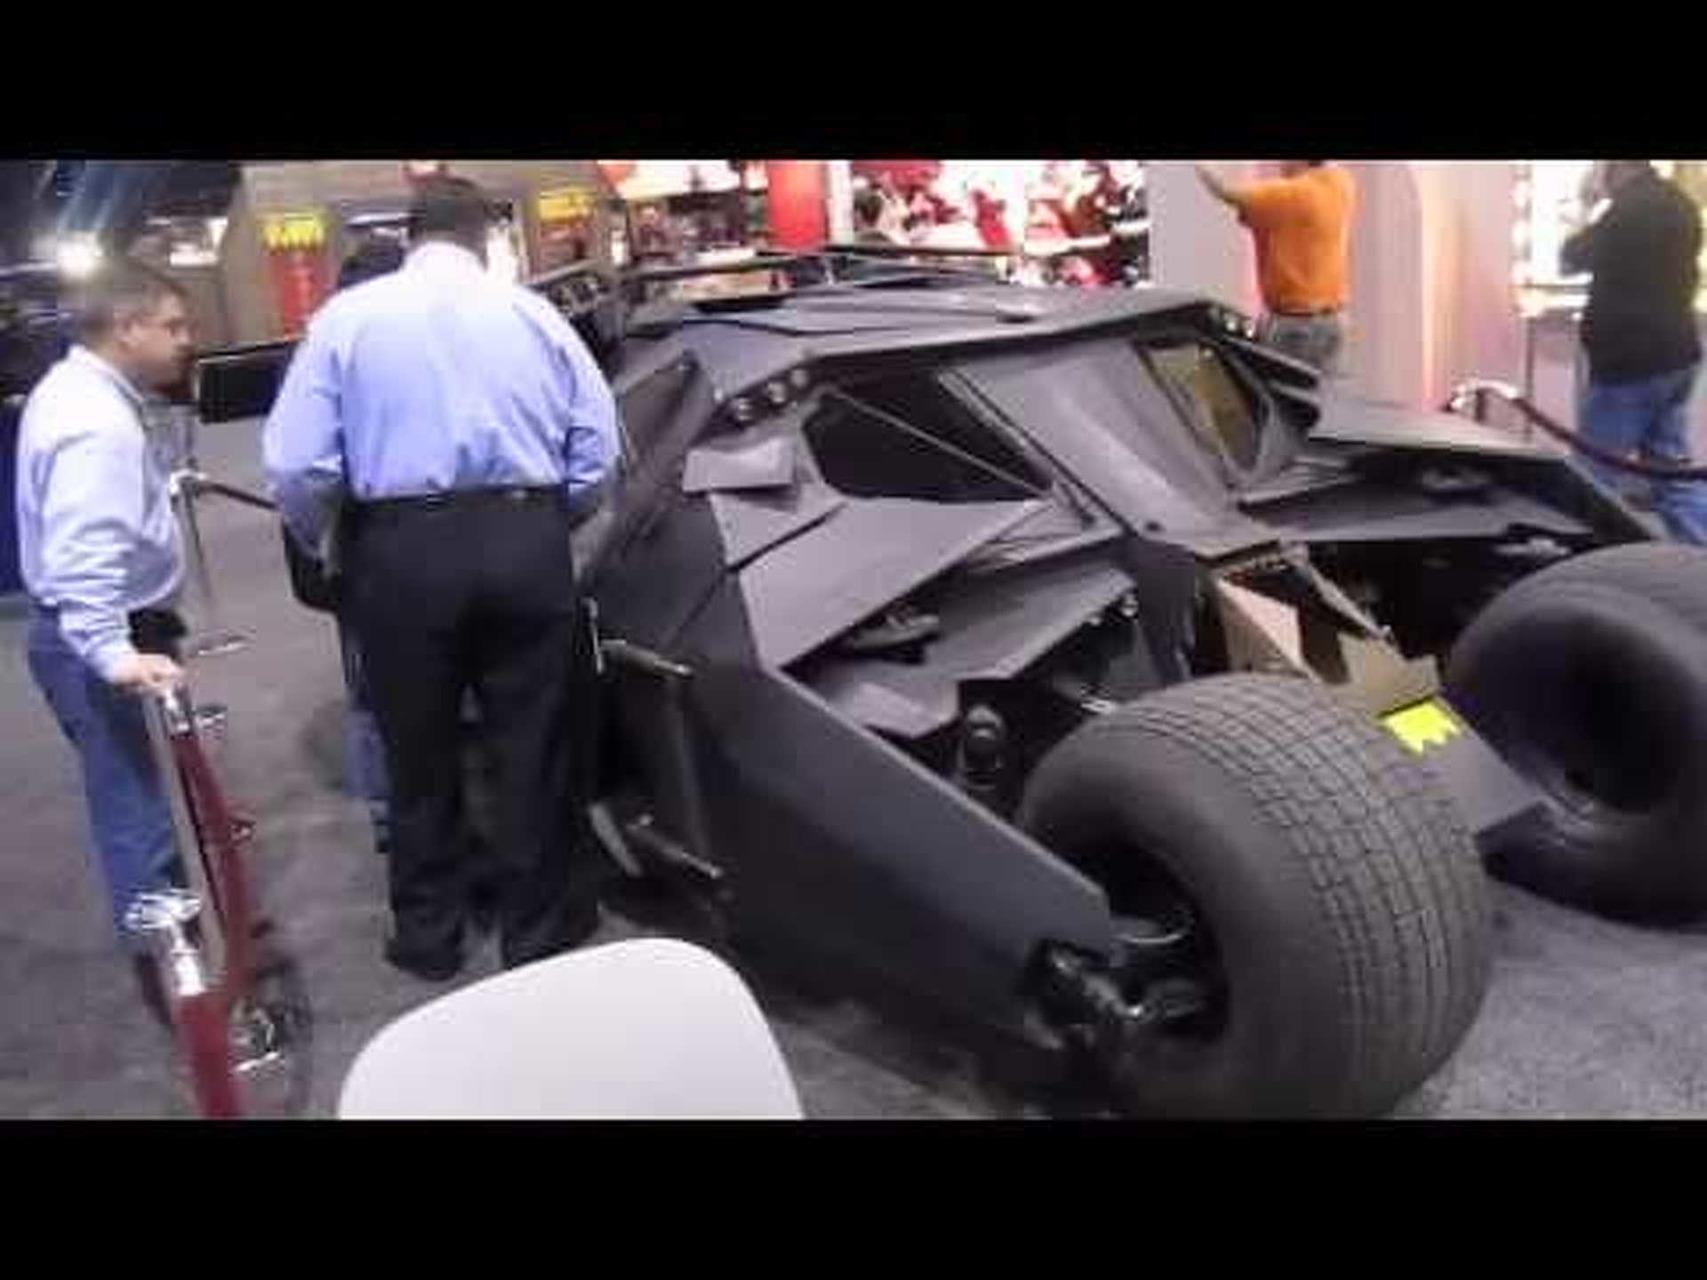 Batman The Dark Night Tumbler